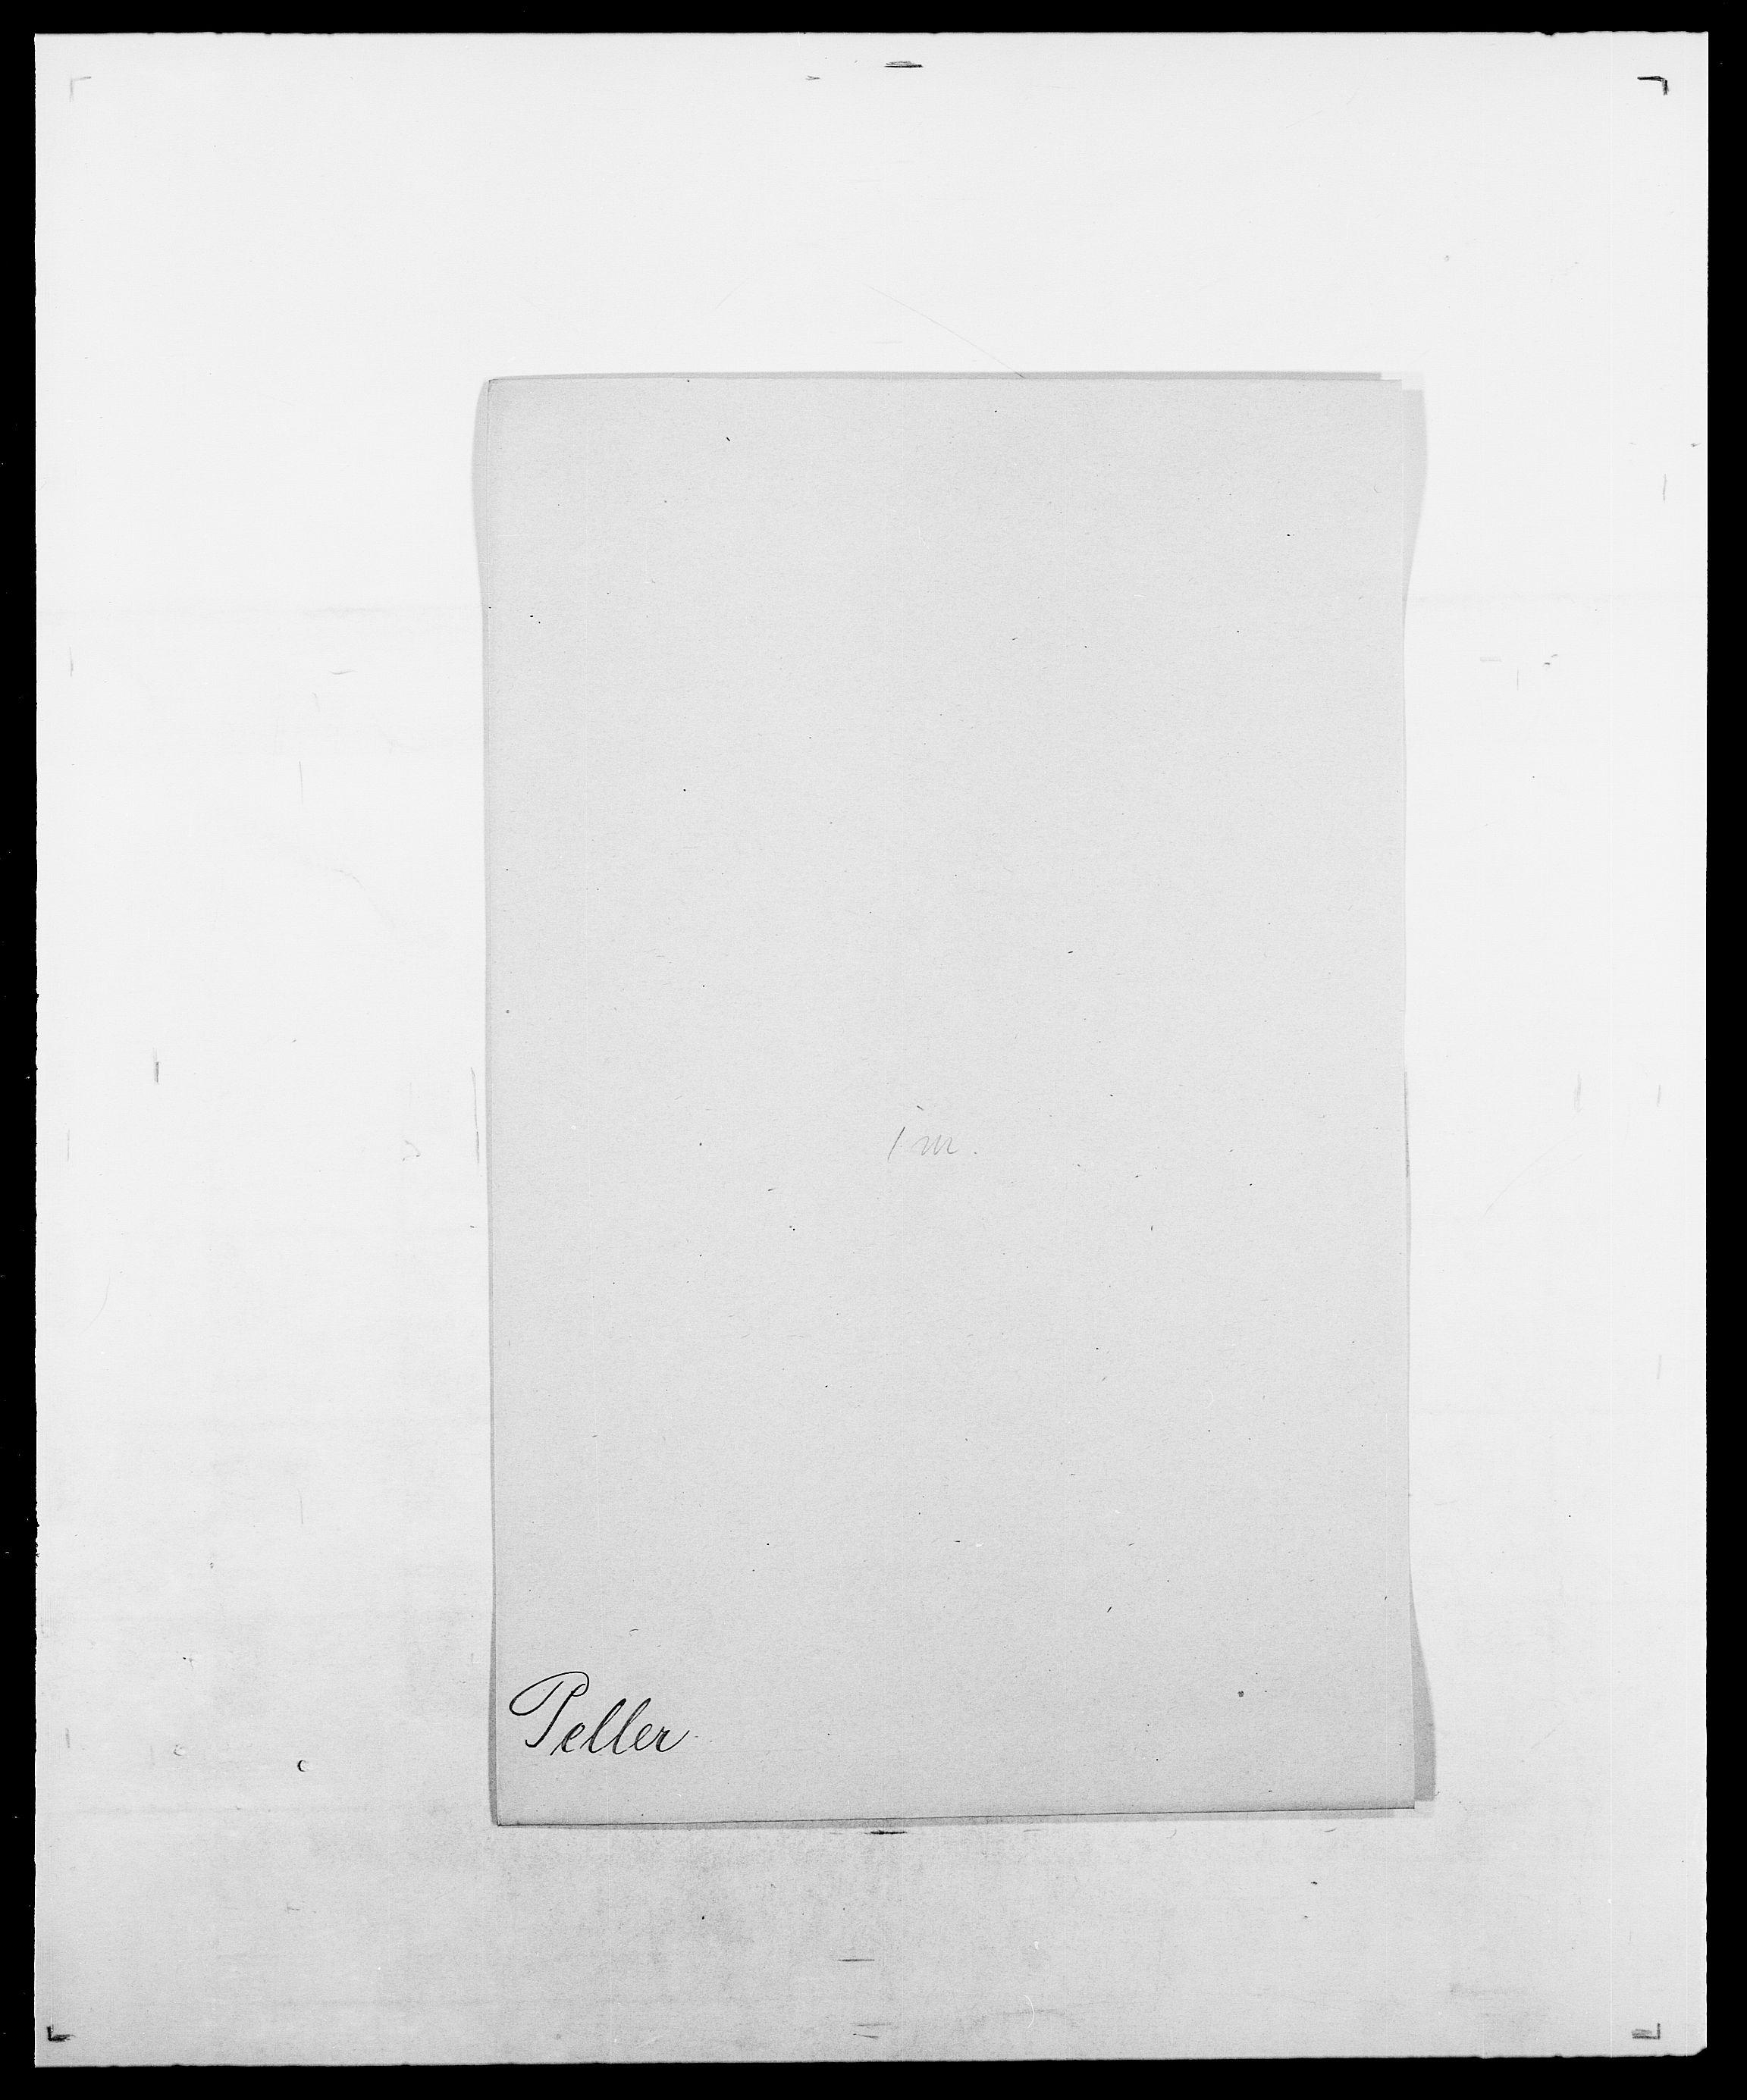 SAO, Delgobe, Charles Antoine - samling, D/Da/L0030: Paars - Pittelkov, s. 335